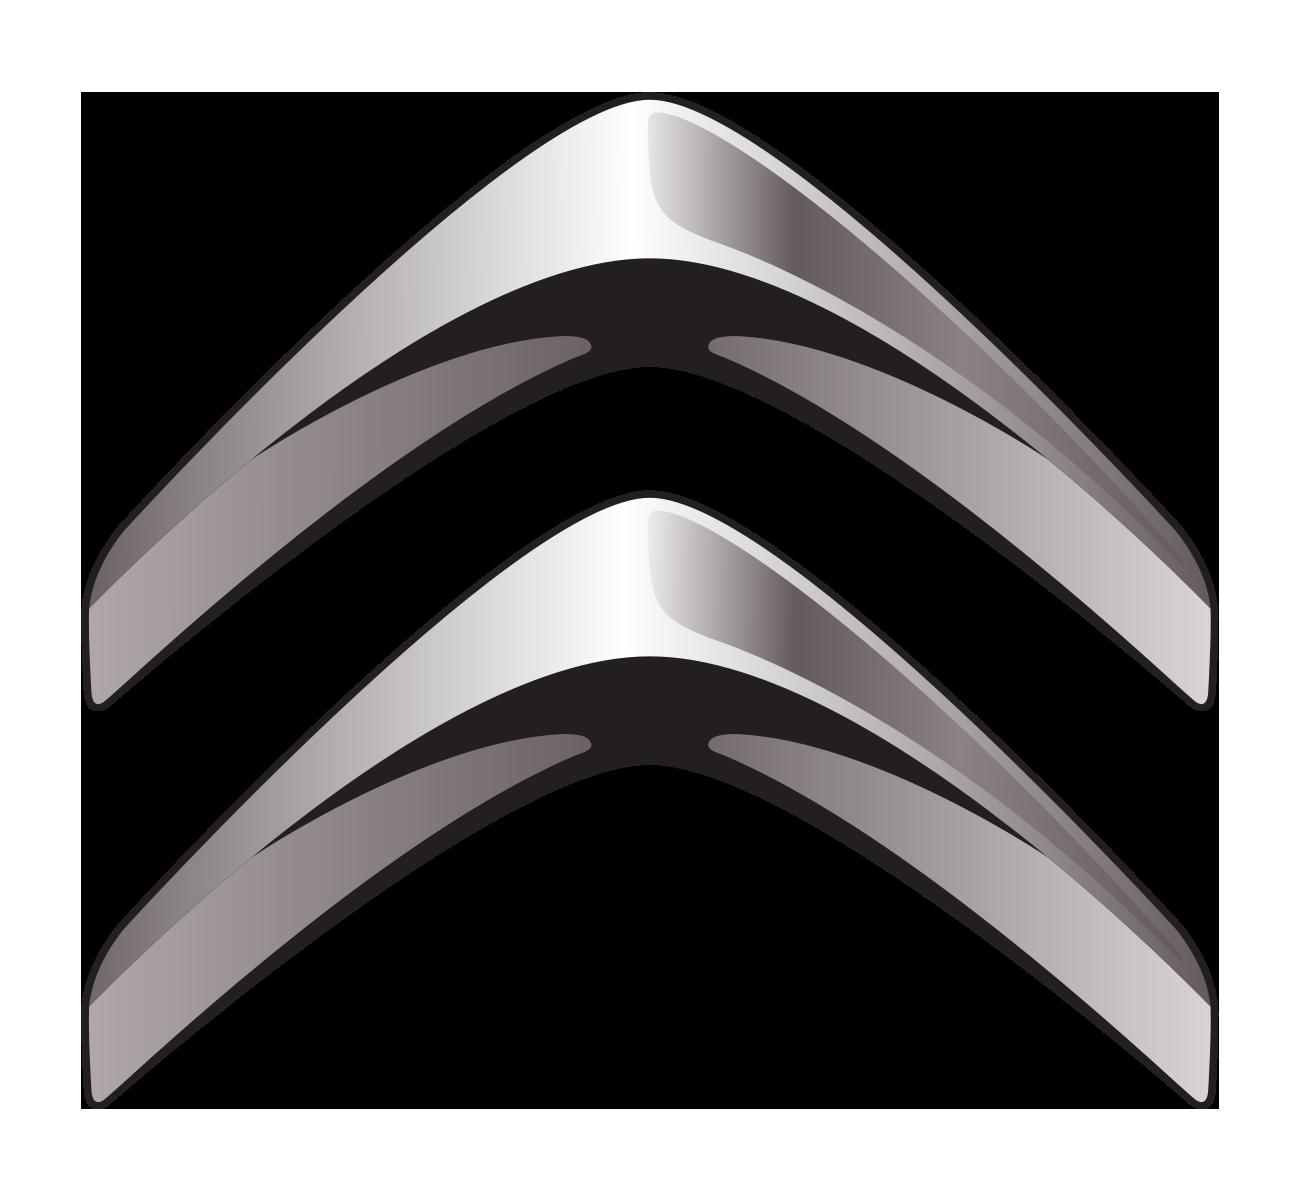 citroen logo Google Search (With images) Citroen logo